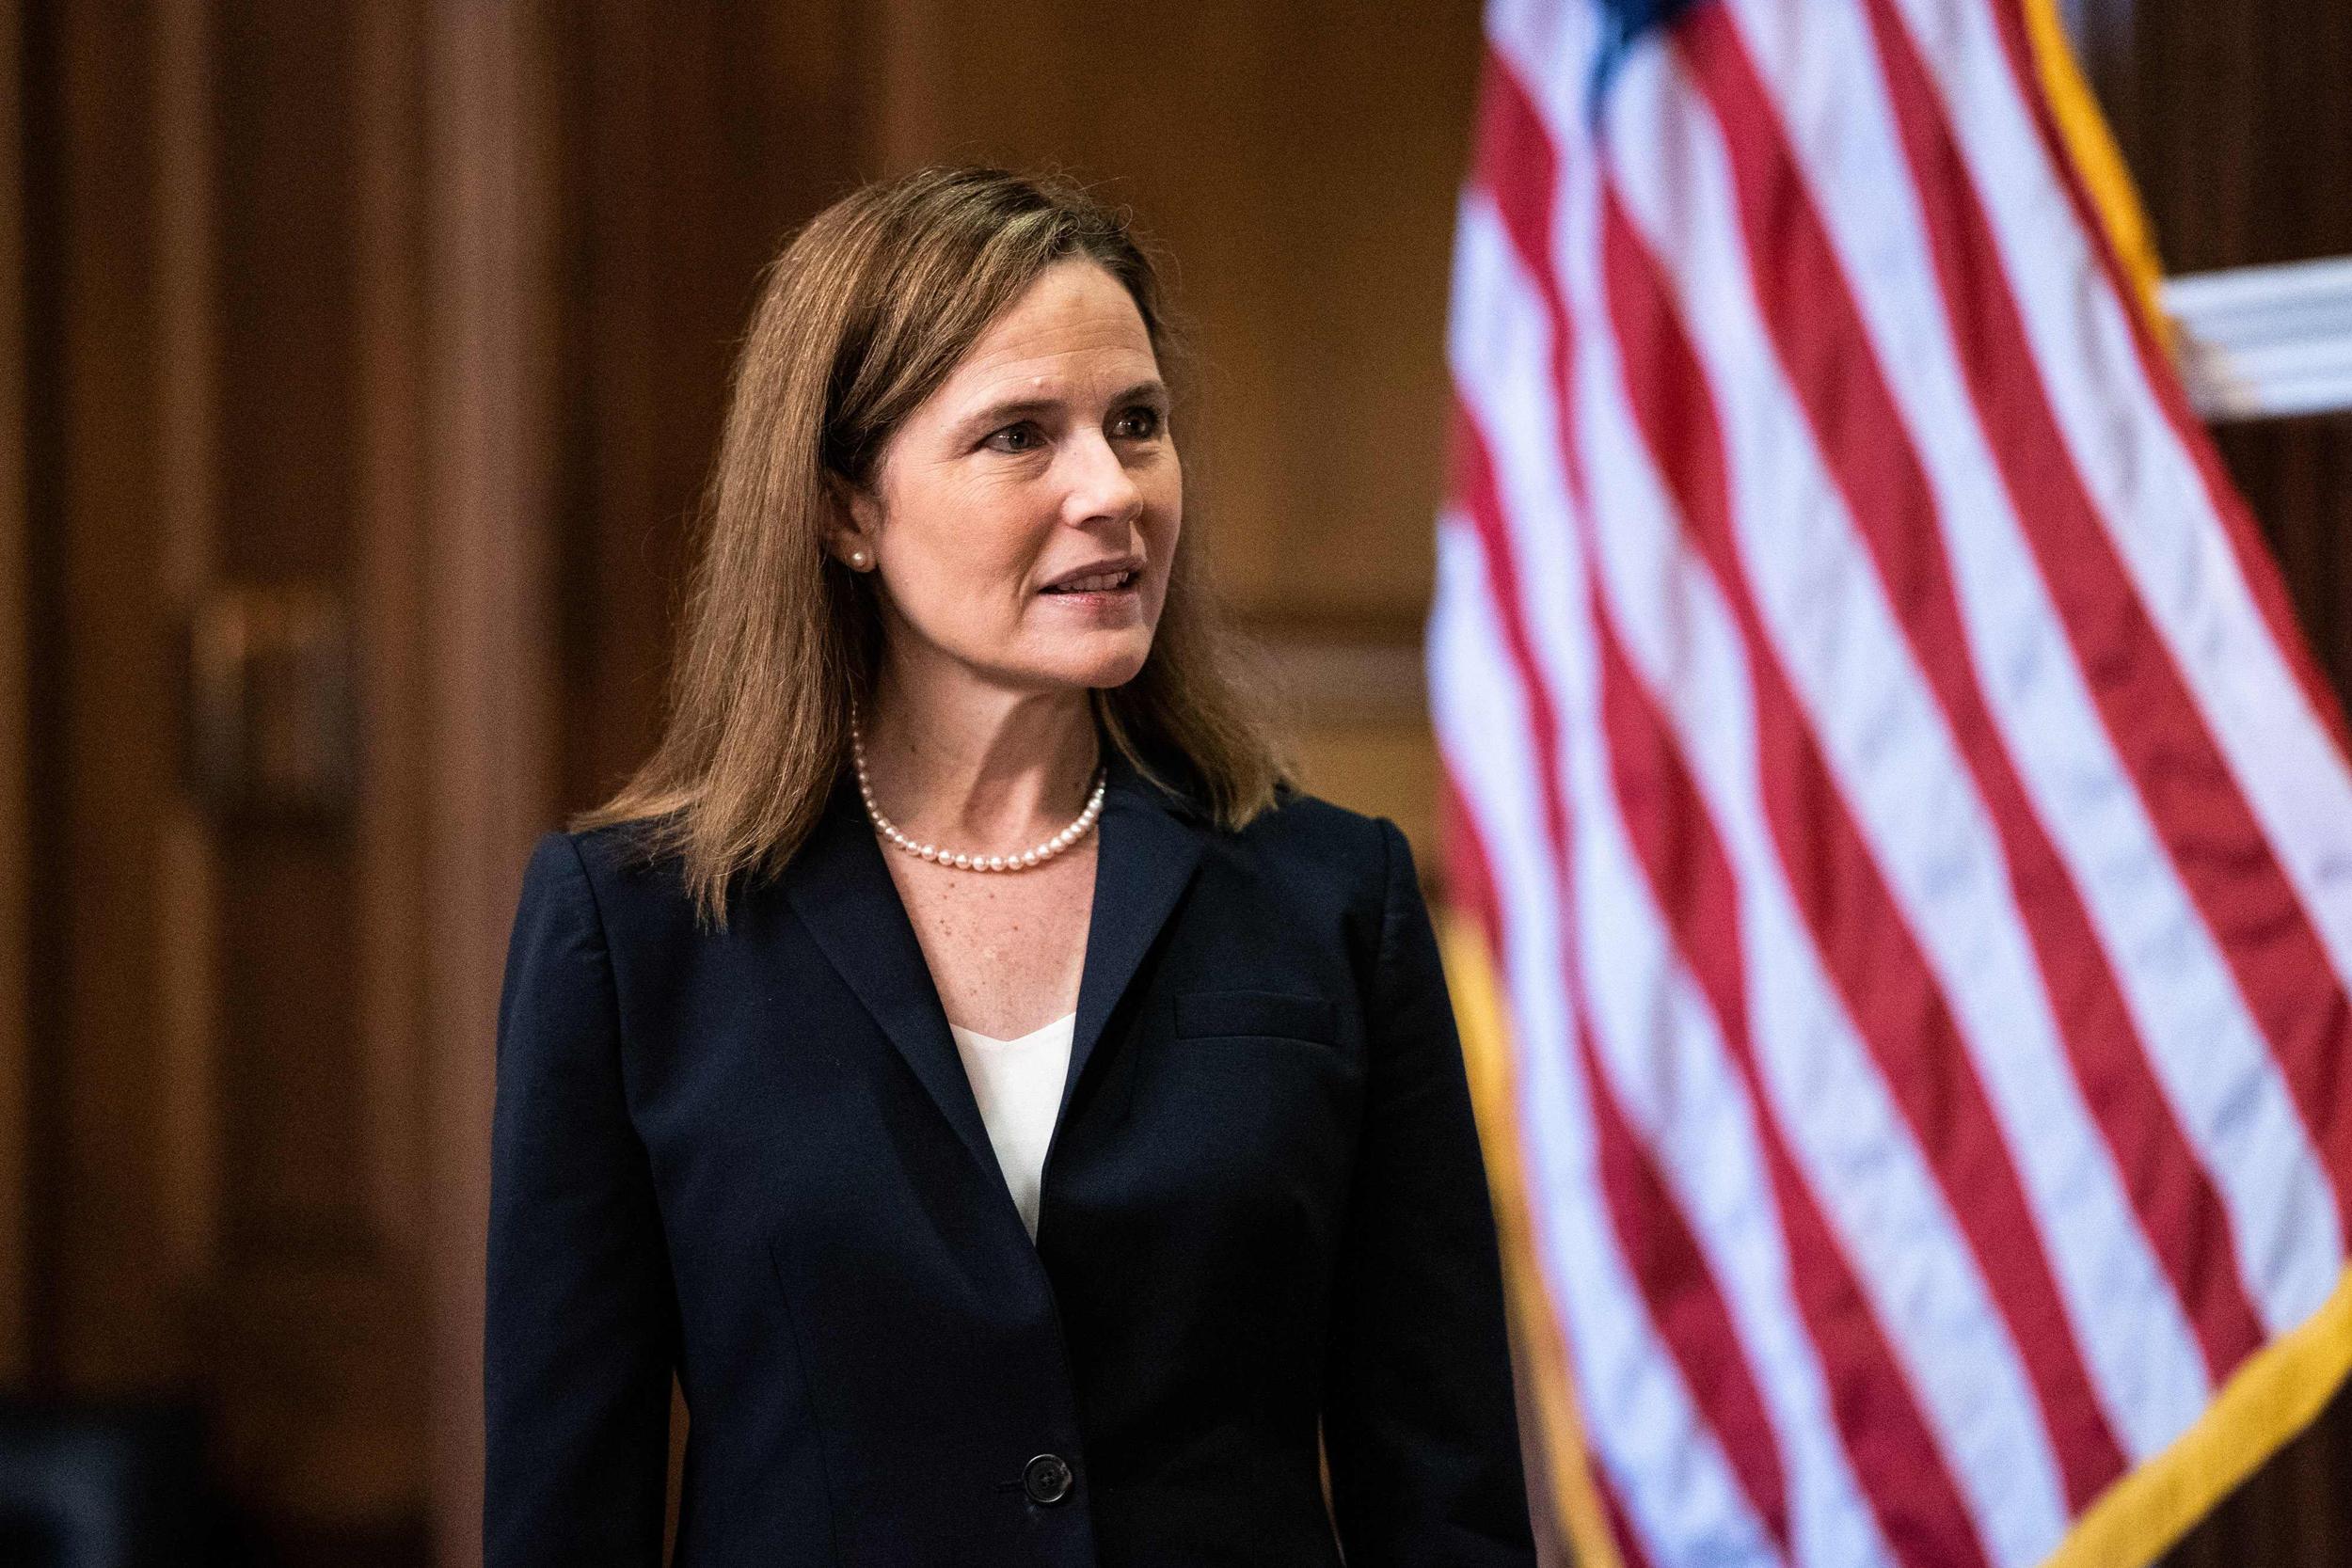 Senate advances Amy Coney Barrett nomination ahead of final confirmation vote